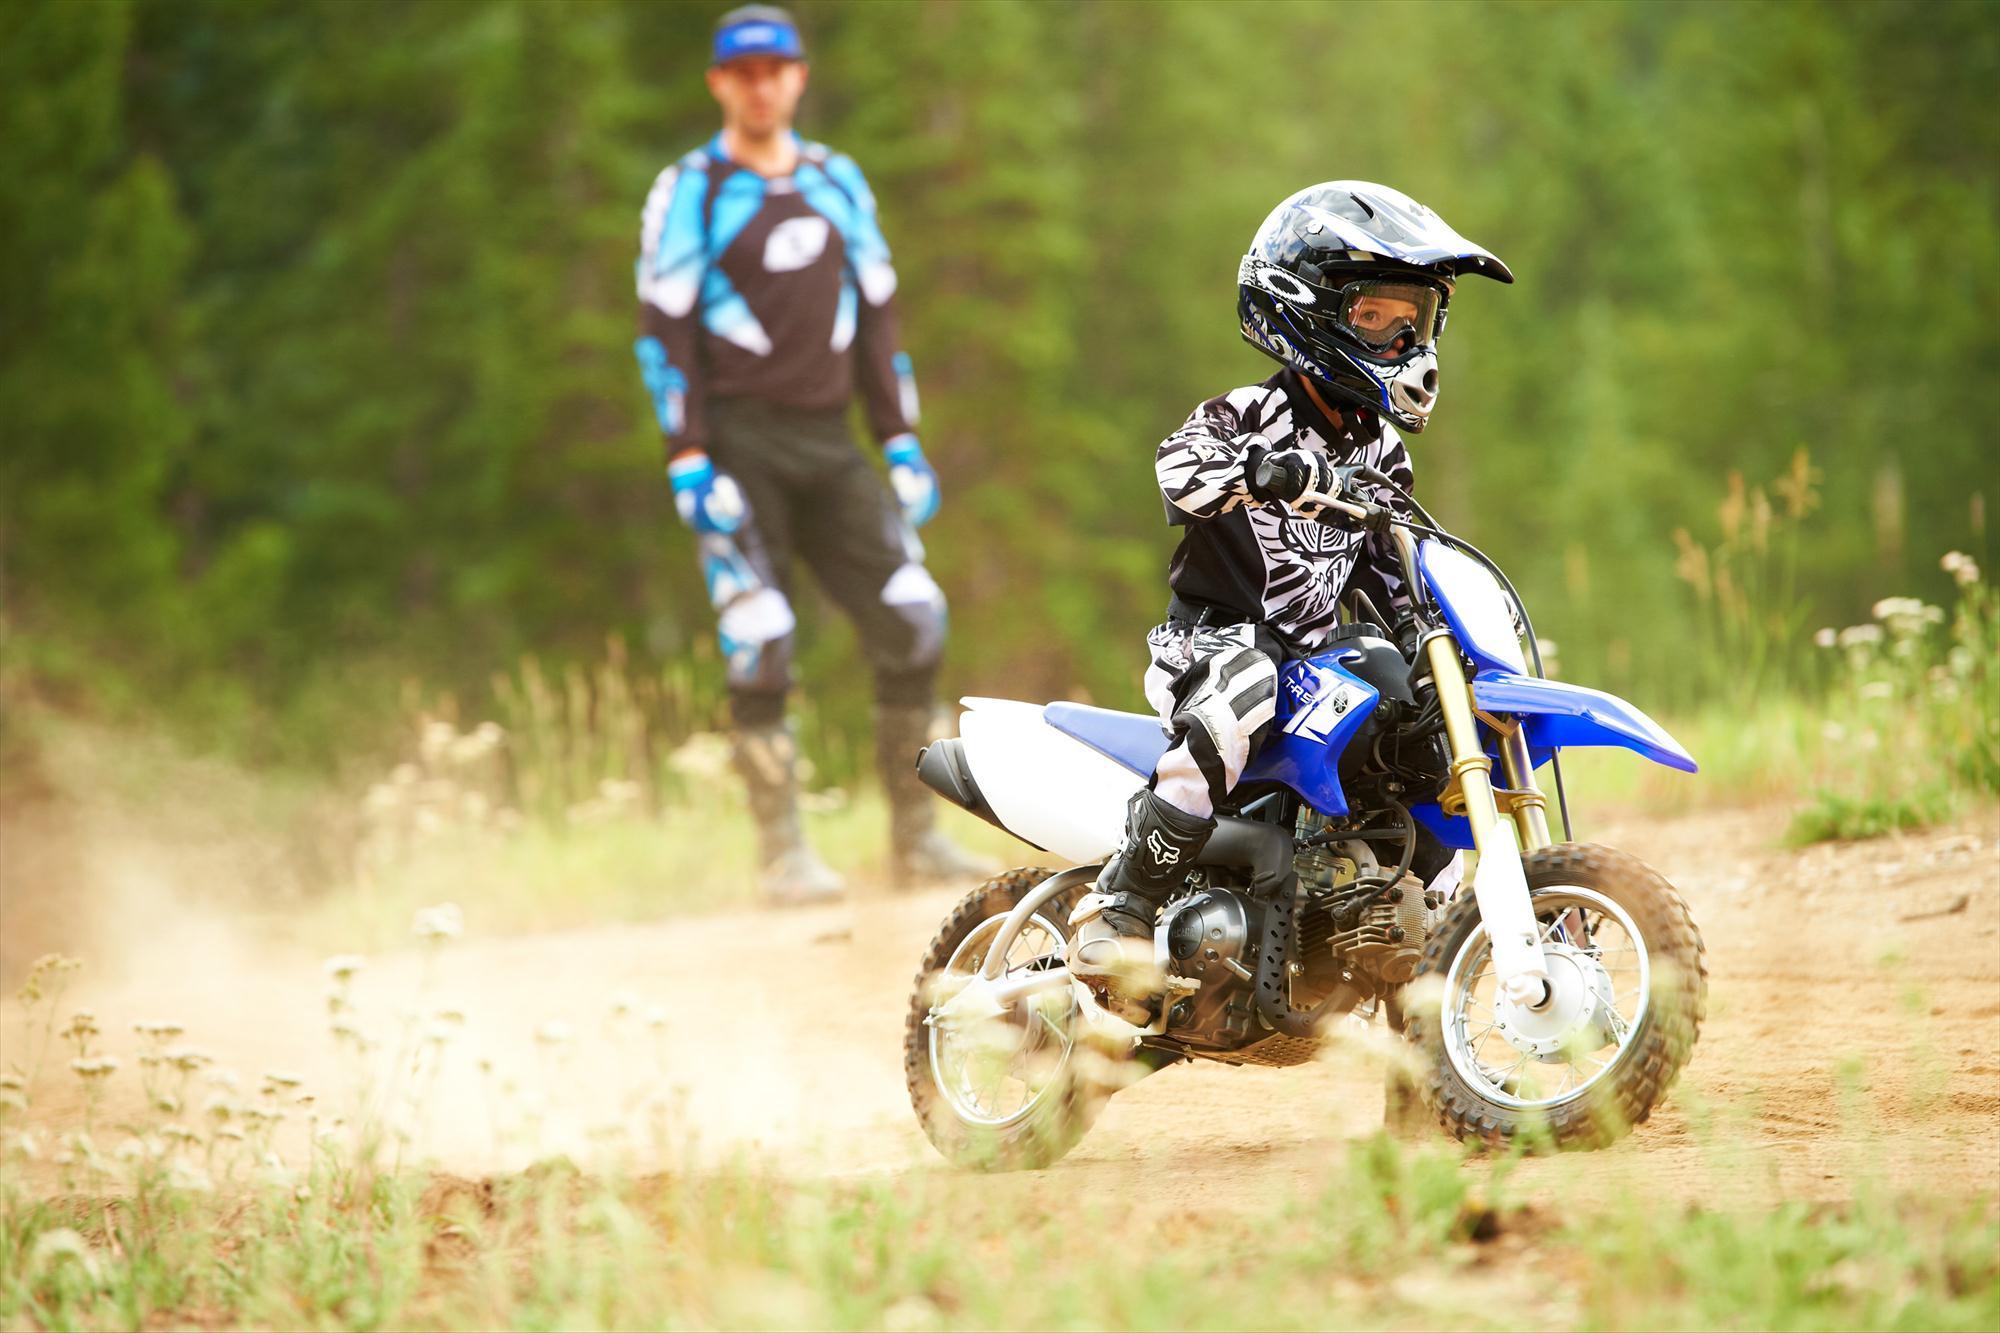 Yamaha 50cc Dirt Bike Engine Diagram Circuit Wiring And Hub Honda 70cc Pit Get Free Image About 80cc